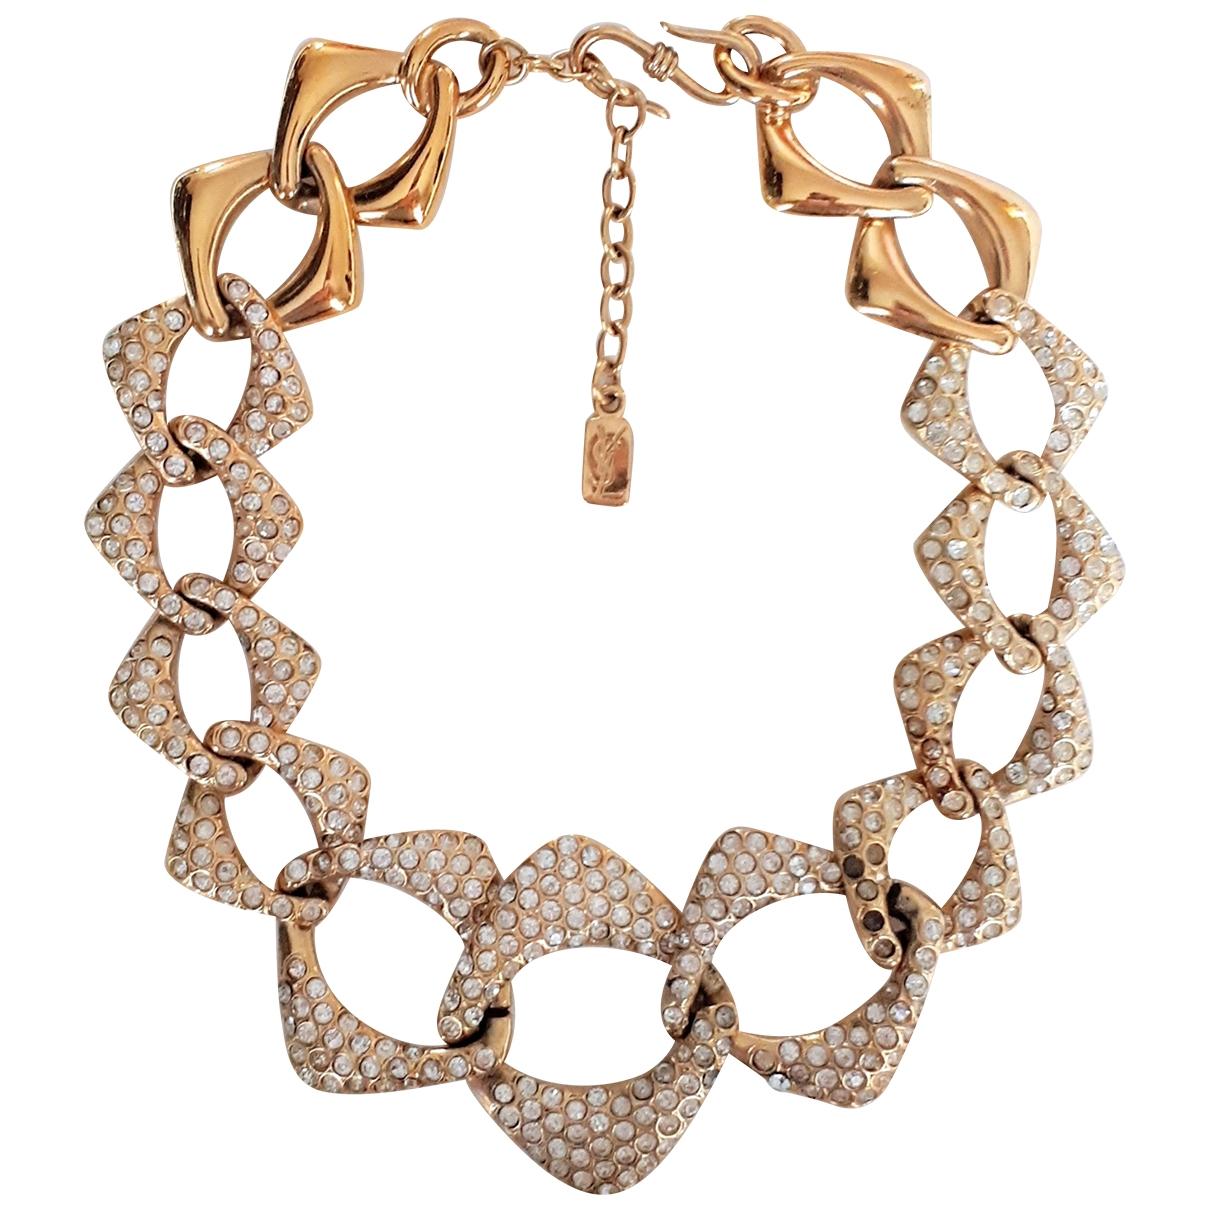 Yves Saint Laurent \N Gold Metal necklace for Women \N